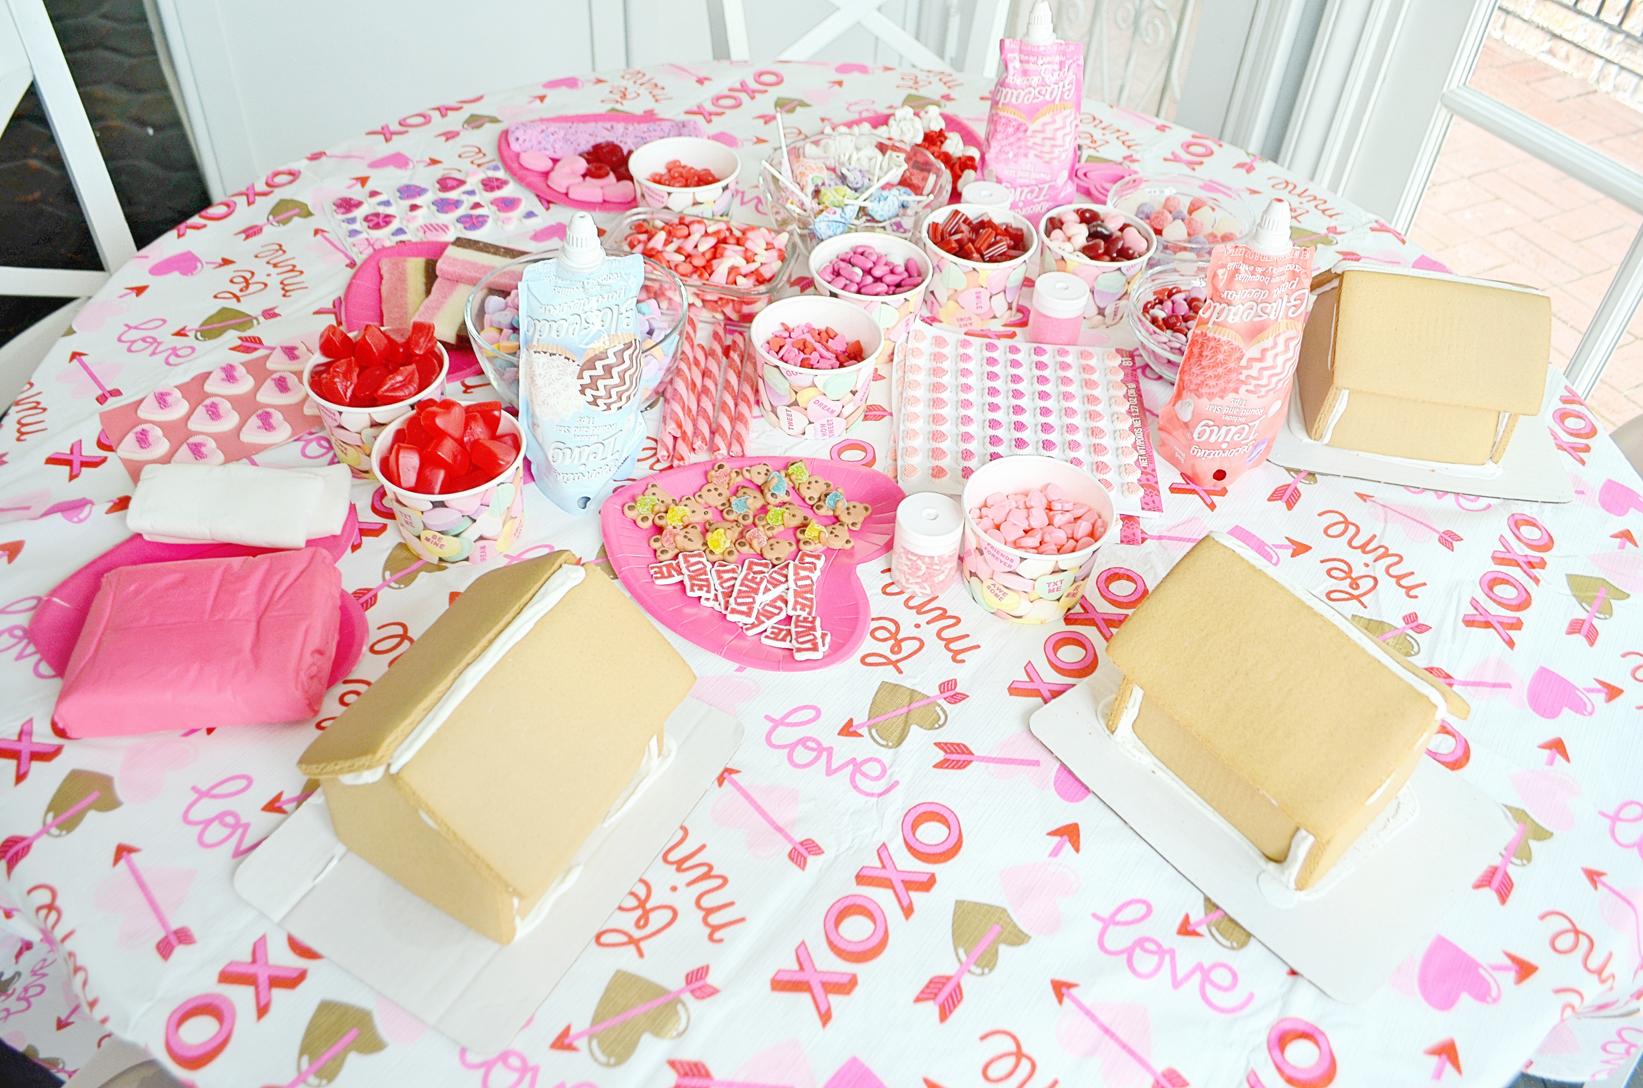 DIY Gingerbread Love Shack Supplies